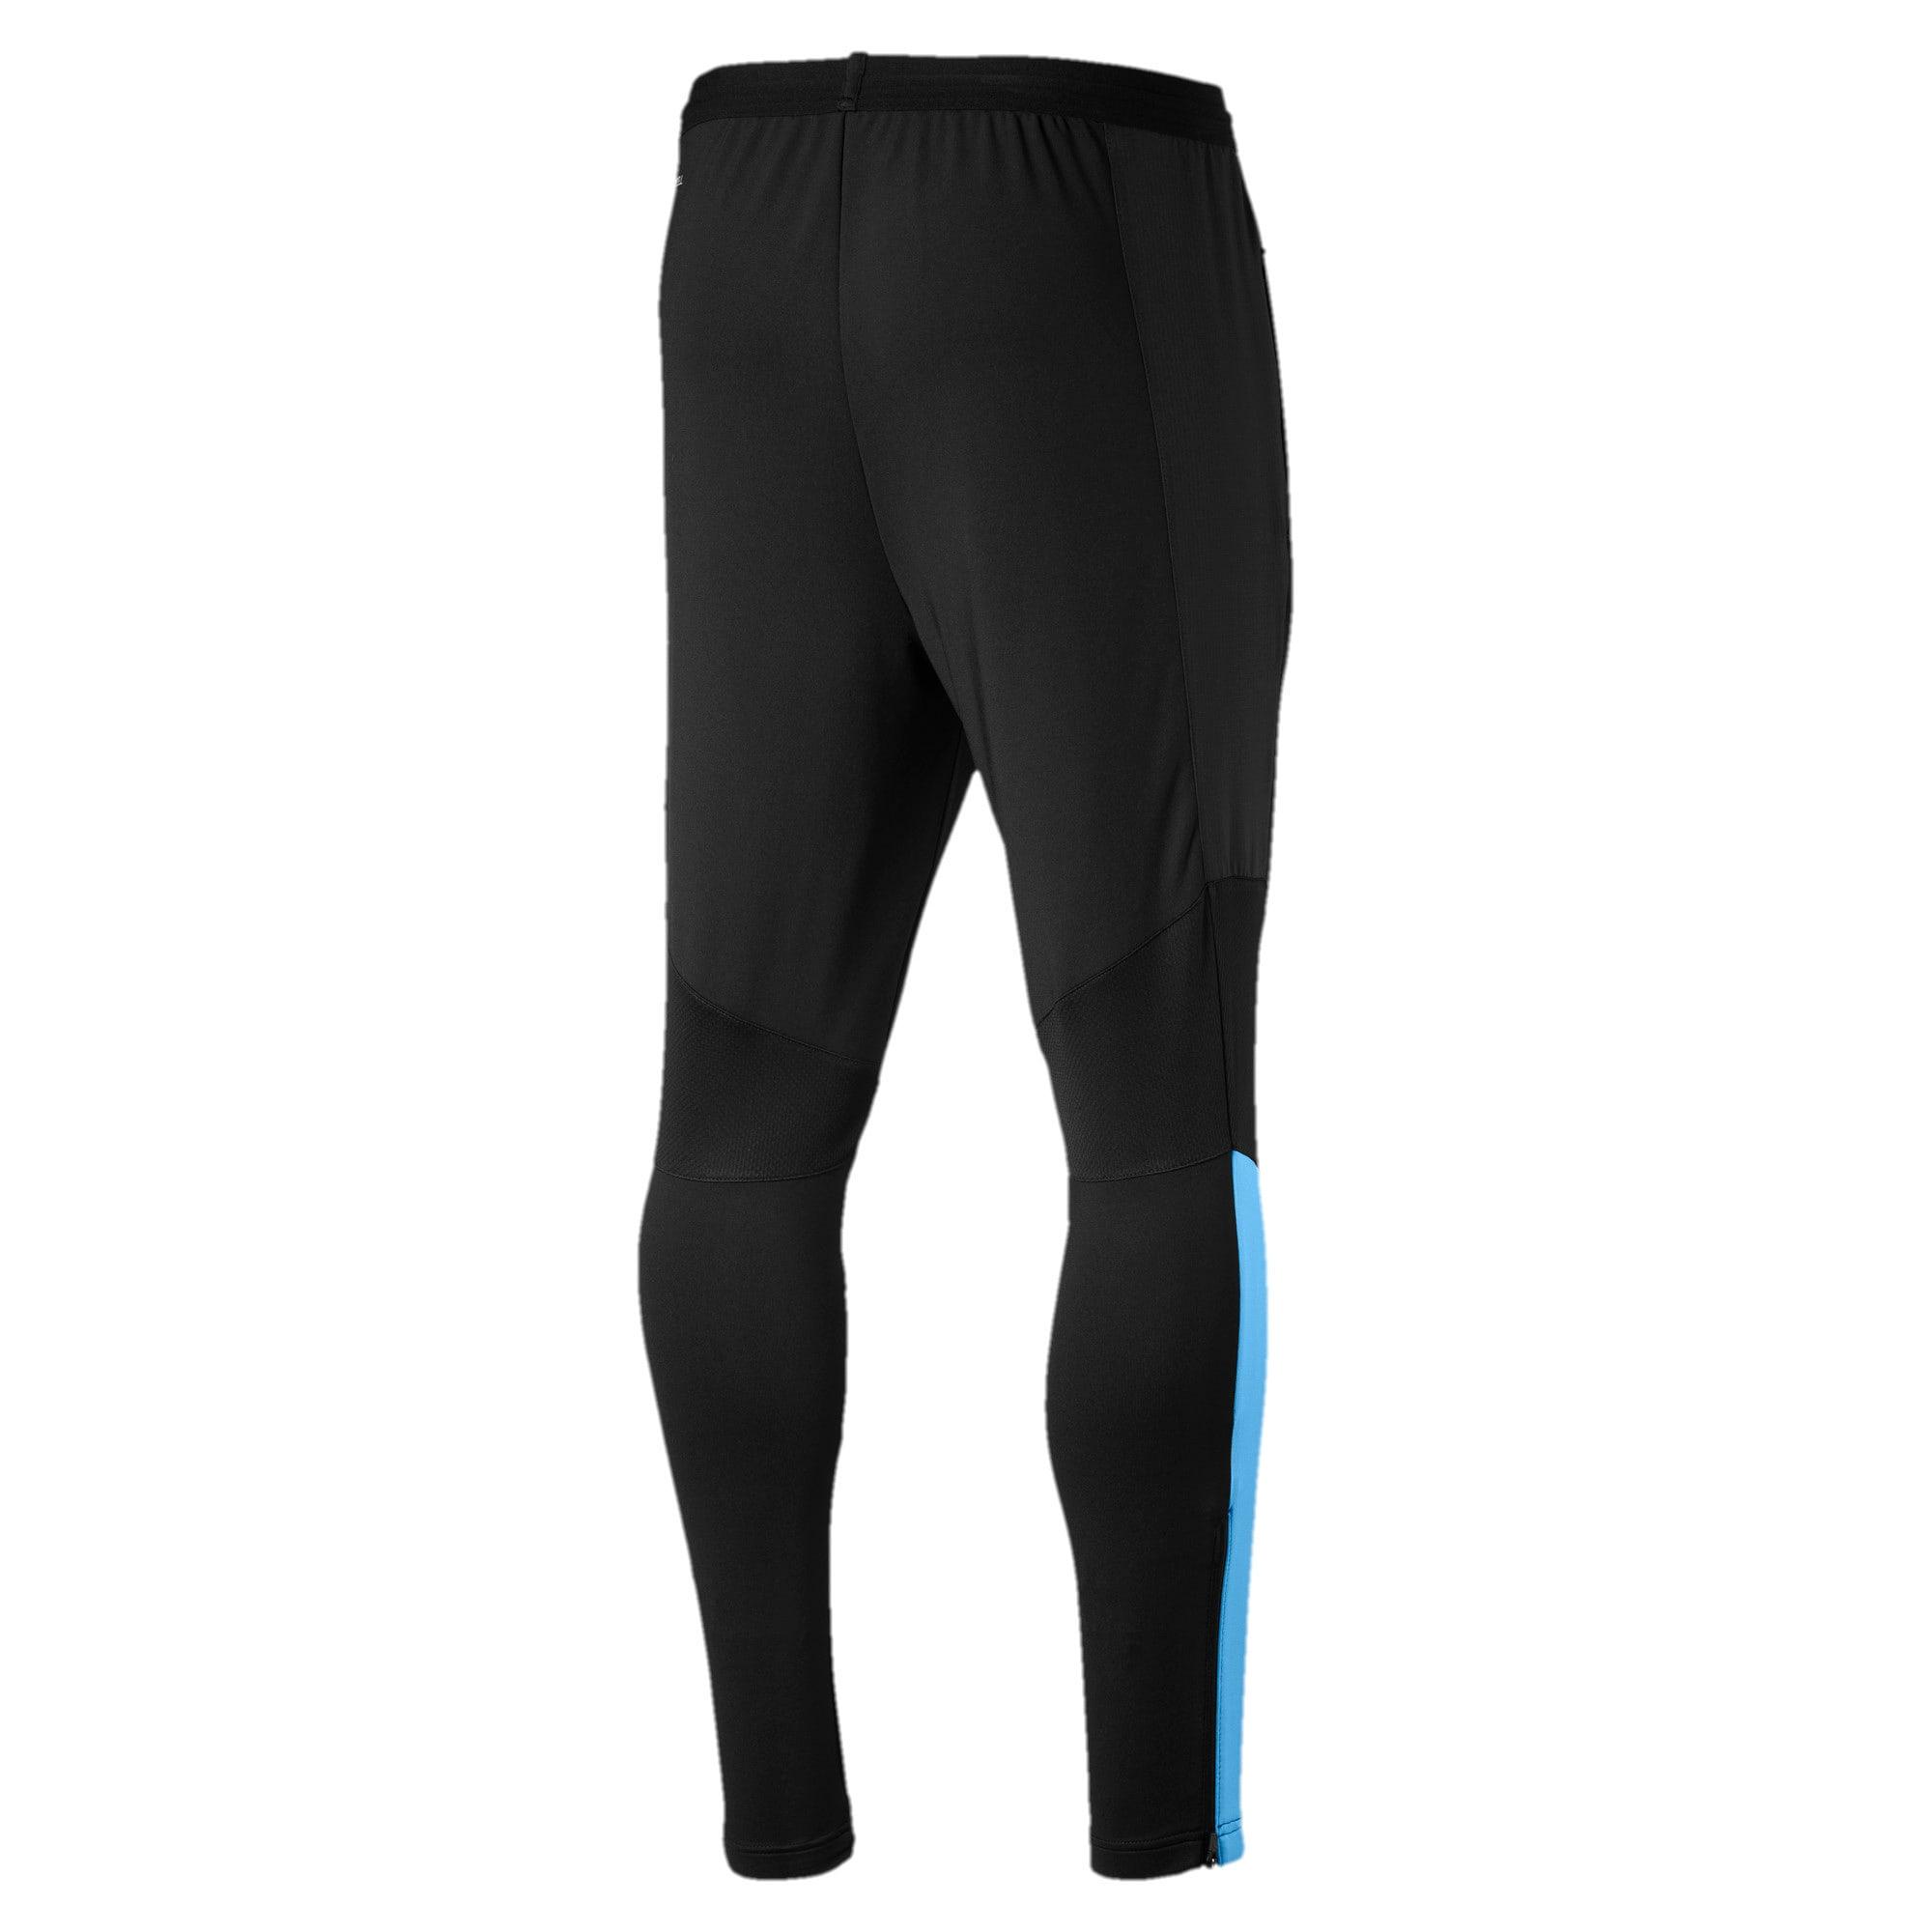 Thumbnail 2 of Manchester City FC Men's Pro Training Pants, Puma Black-Team Light Blue, medium